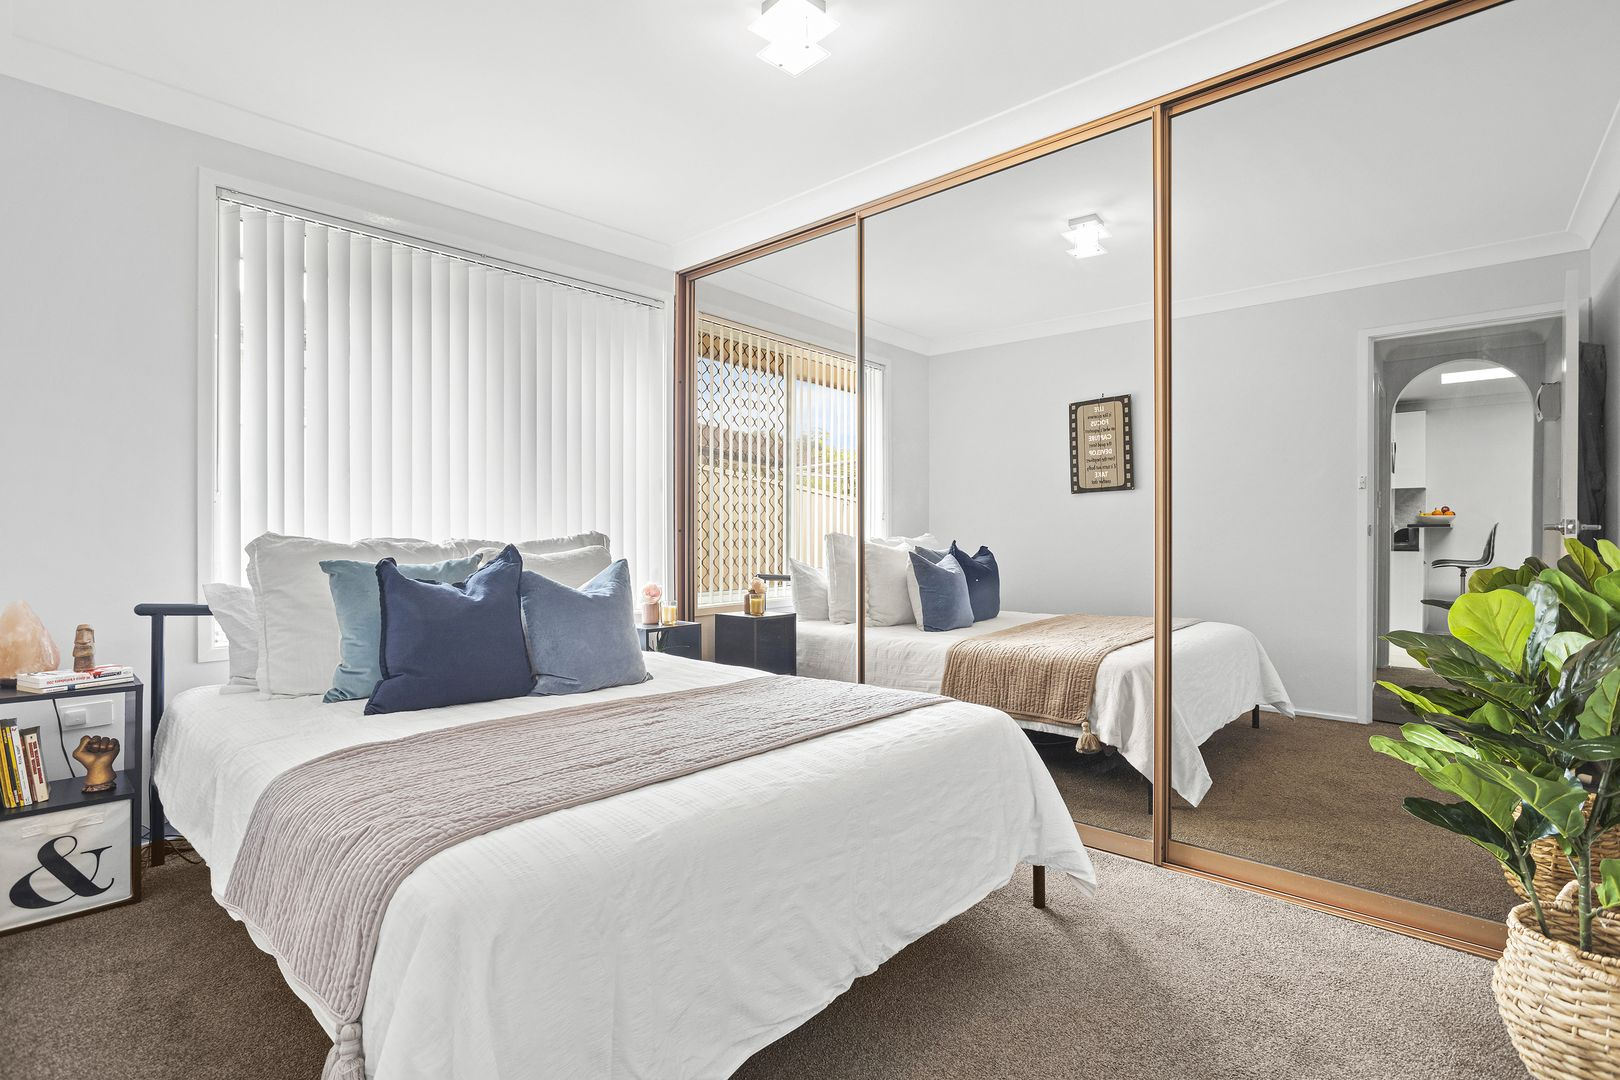 4/14 Strathearn Avenue, Wollongong NSW 2500, Image 2